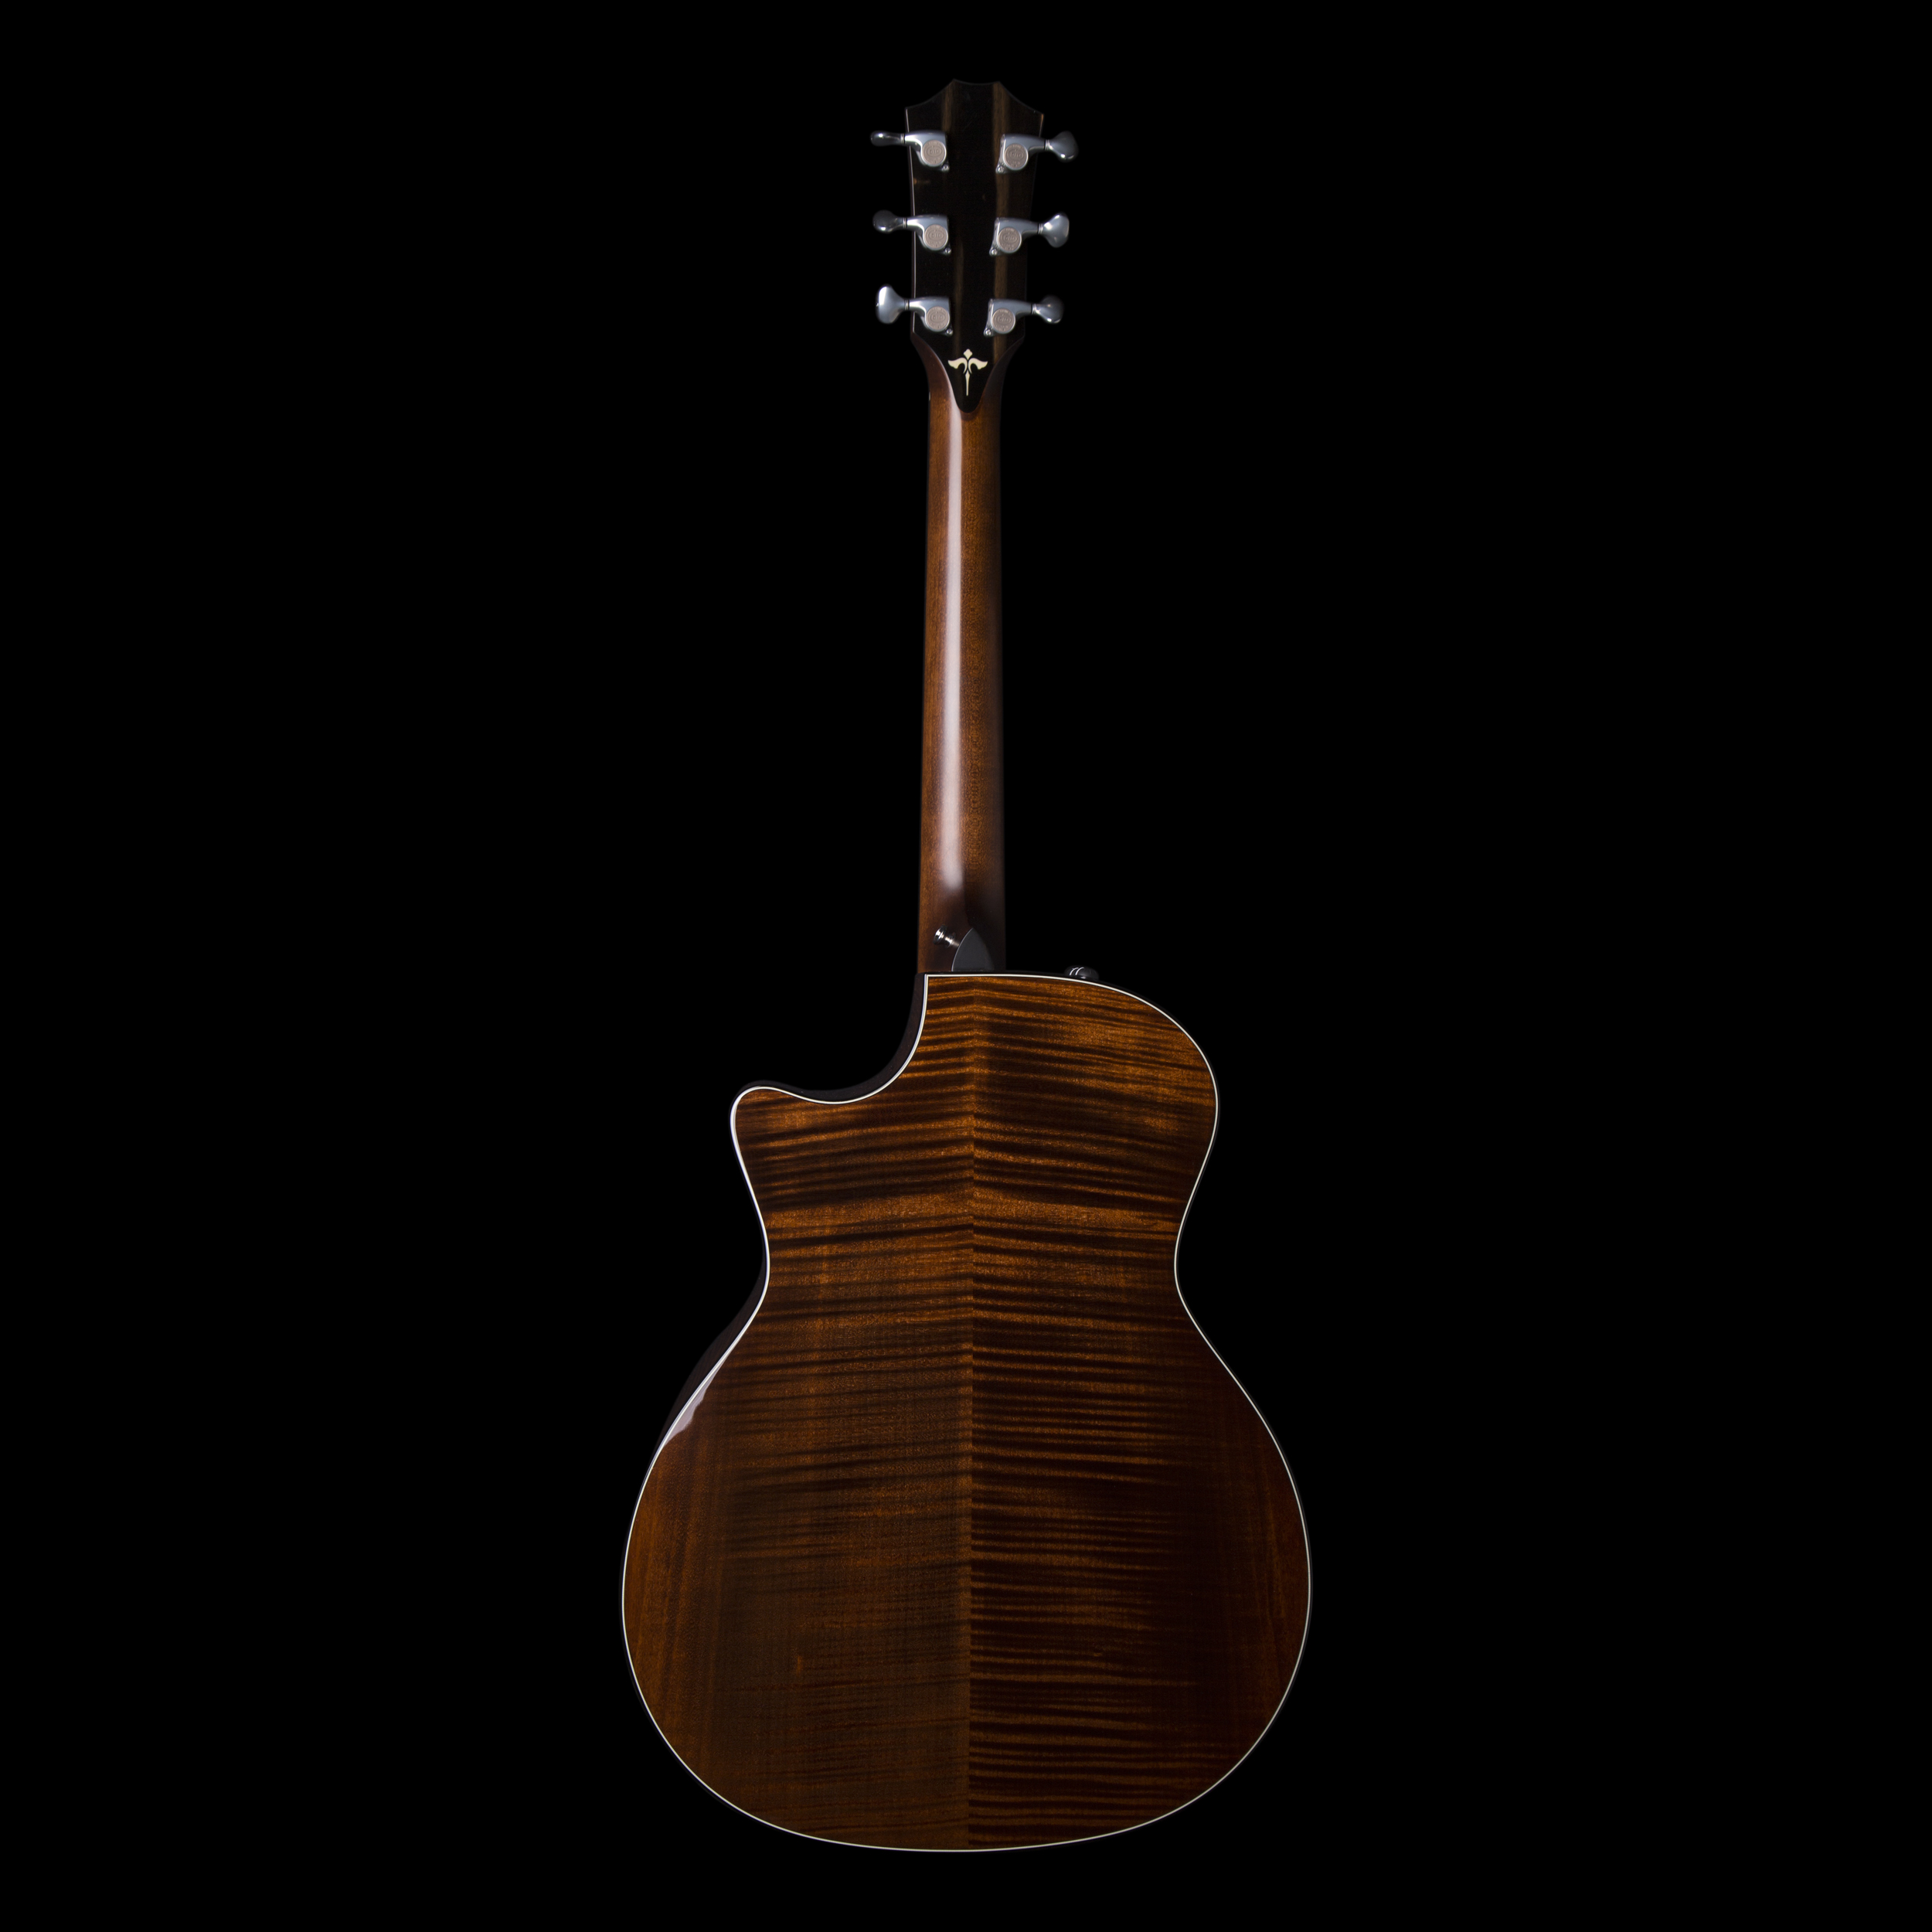 taylor 614ce grand auditorium acoustic electric guitar 2015 spec w gotoh tuners ebay. Black Bedroom Furniture Sets. Home Design Ideas